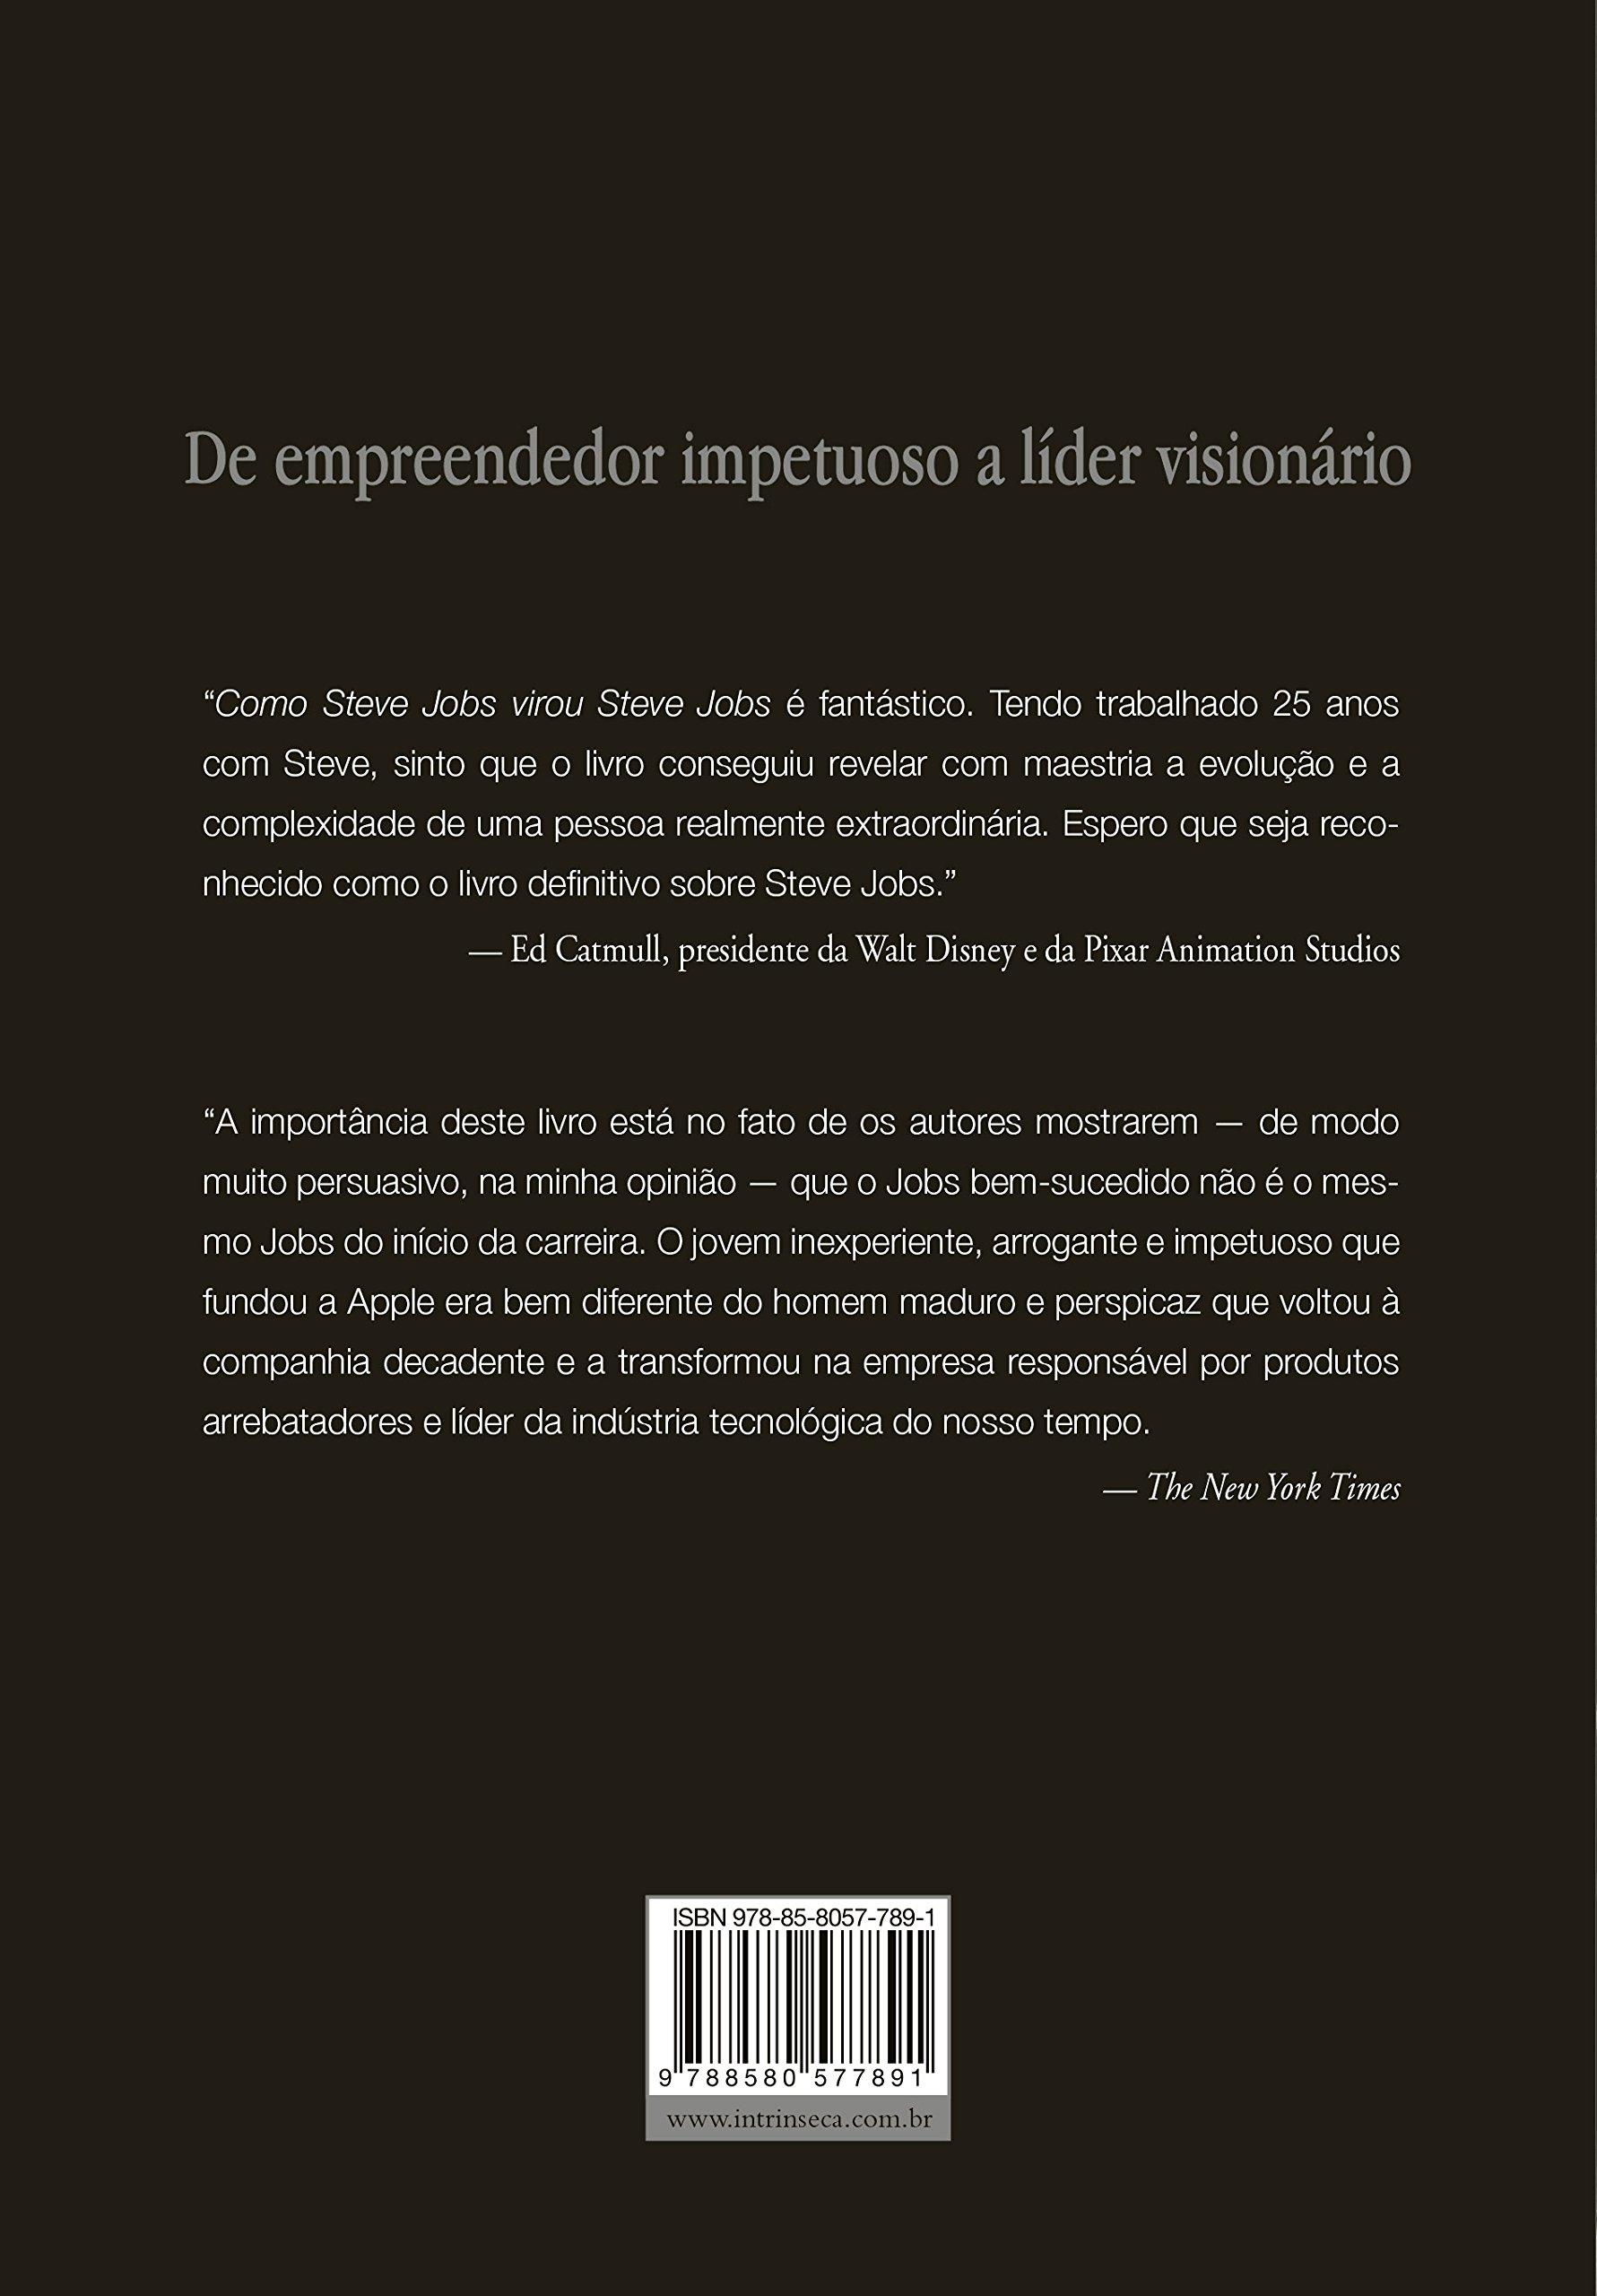 a6d5a8dcd3f Como Steve Jobs Virou Steve Jobs - 9788580577891 - Livros na Amazon Brasil